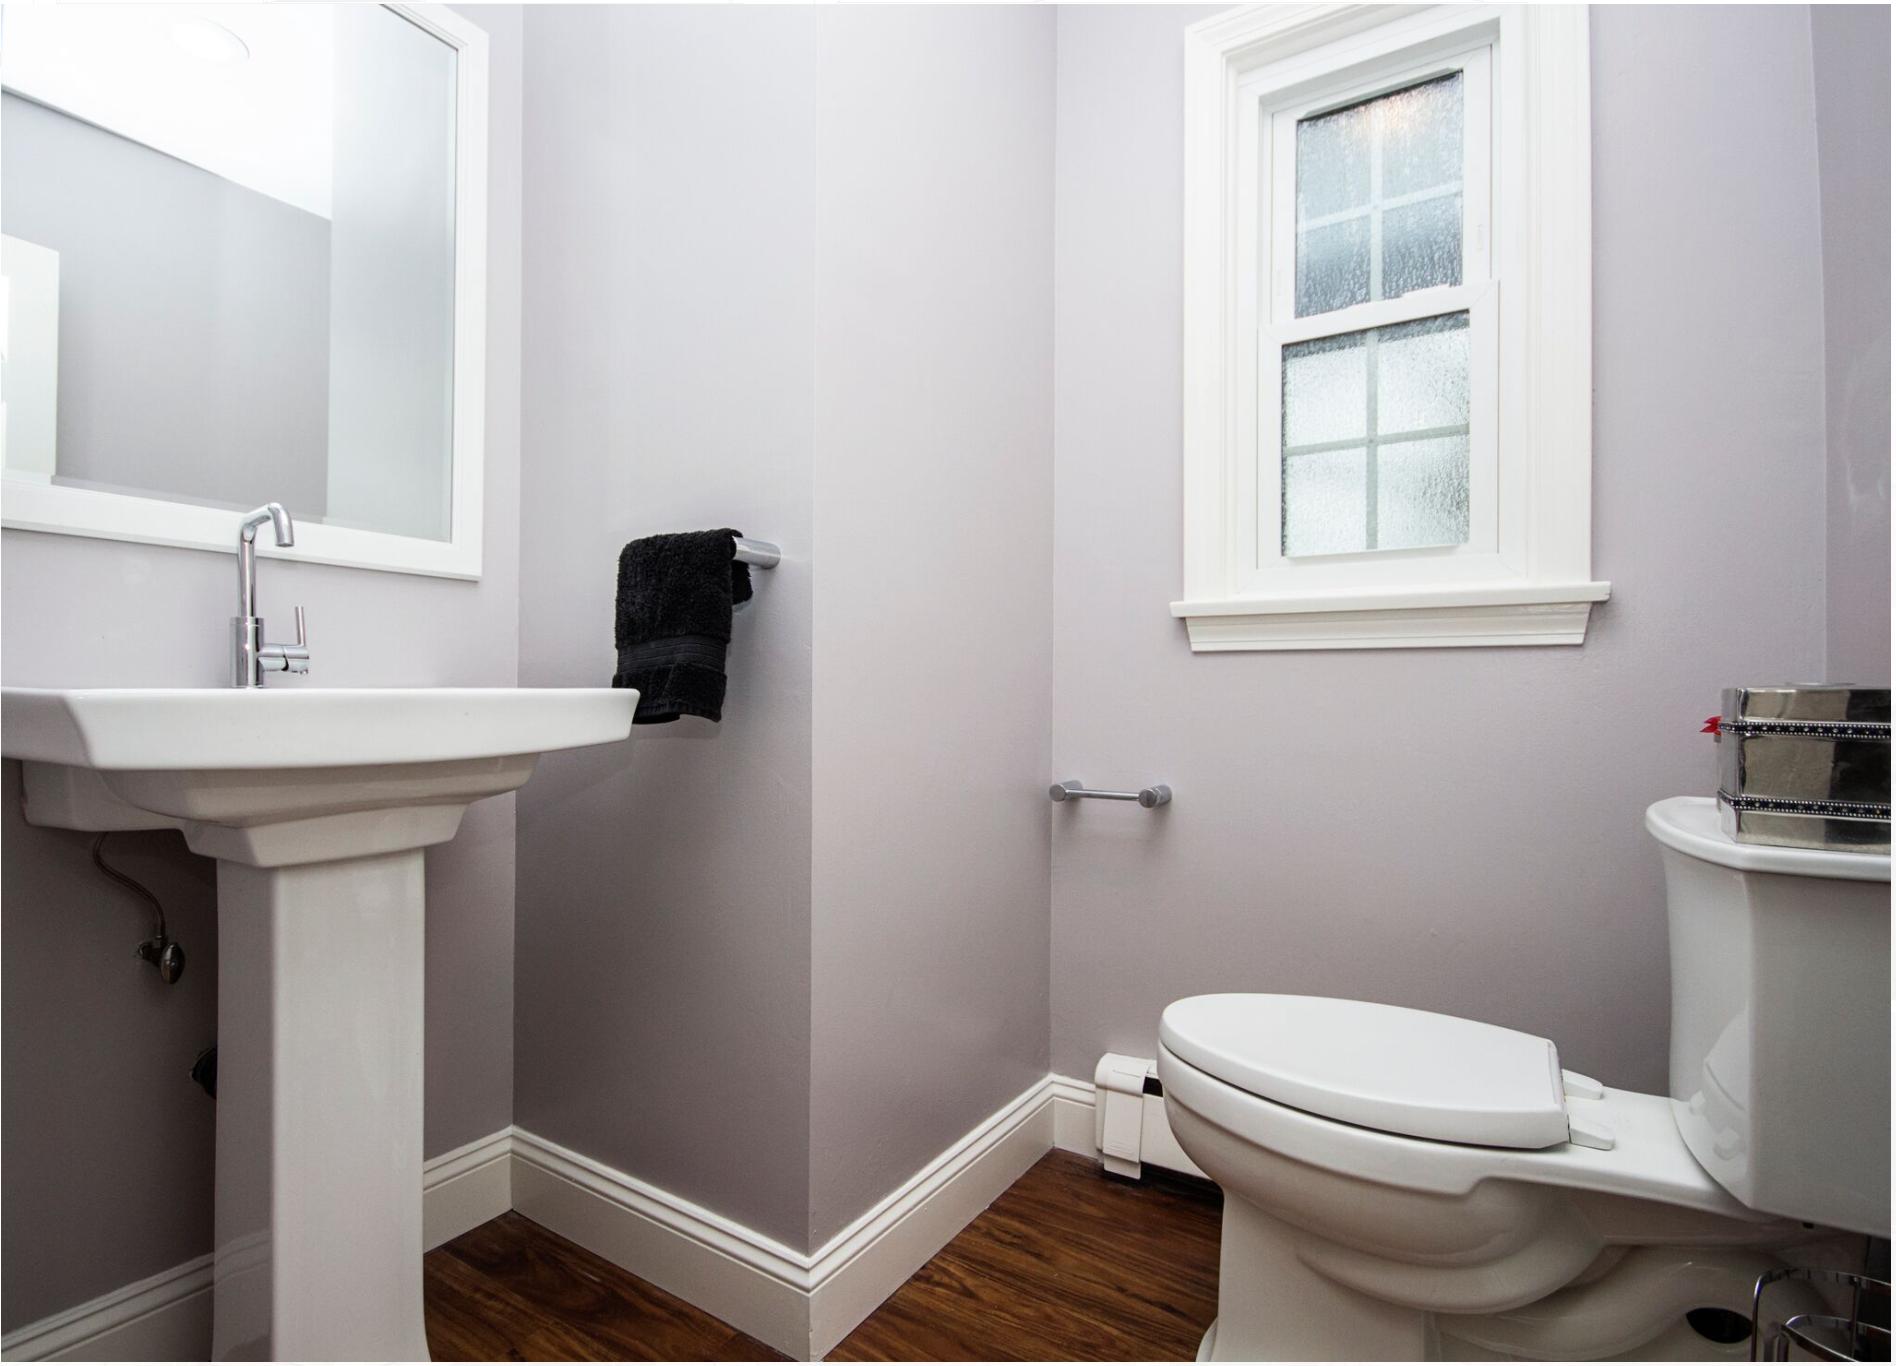 Guest Bathroom Featuring White Kohler Pedestal Sink Kohler Toilet